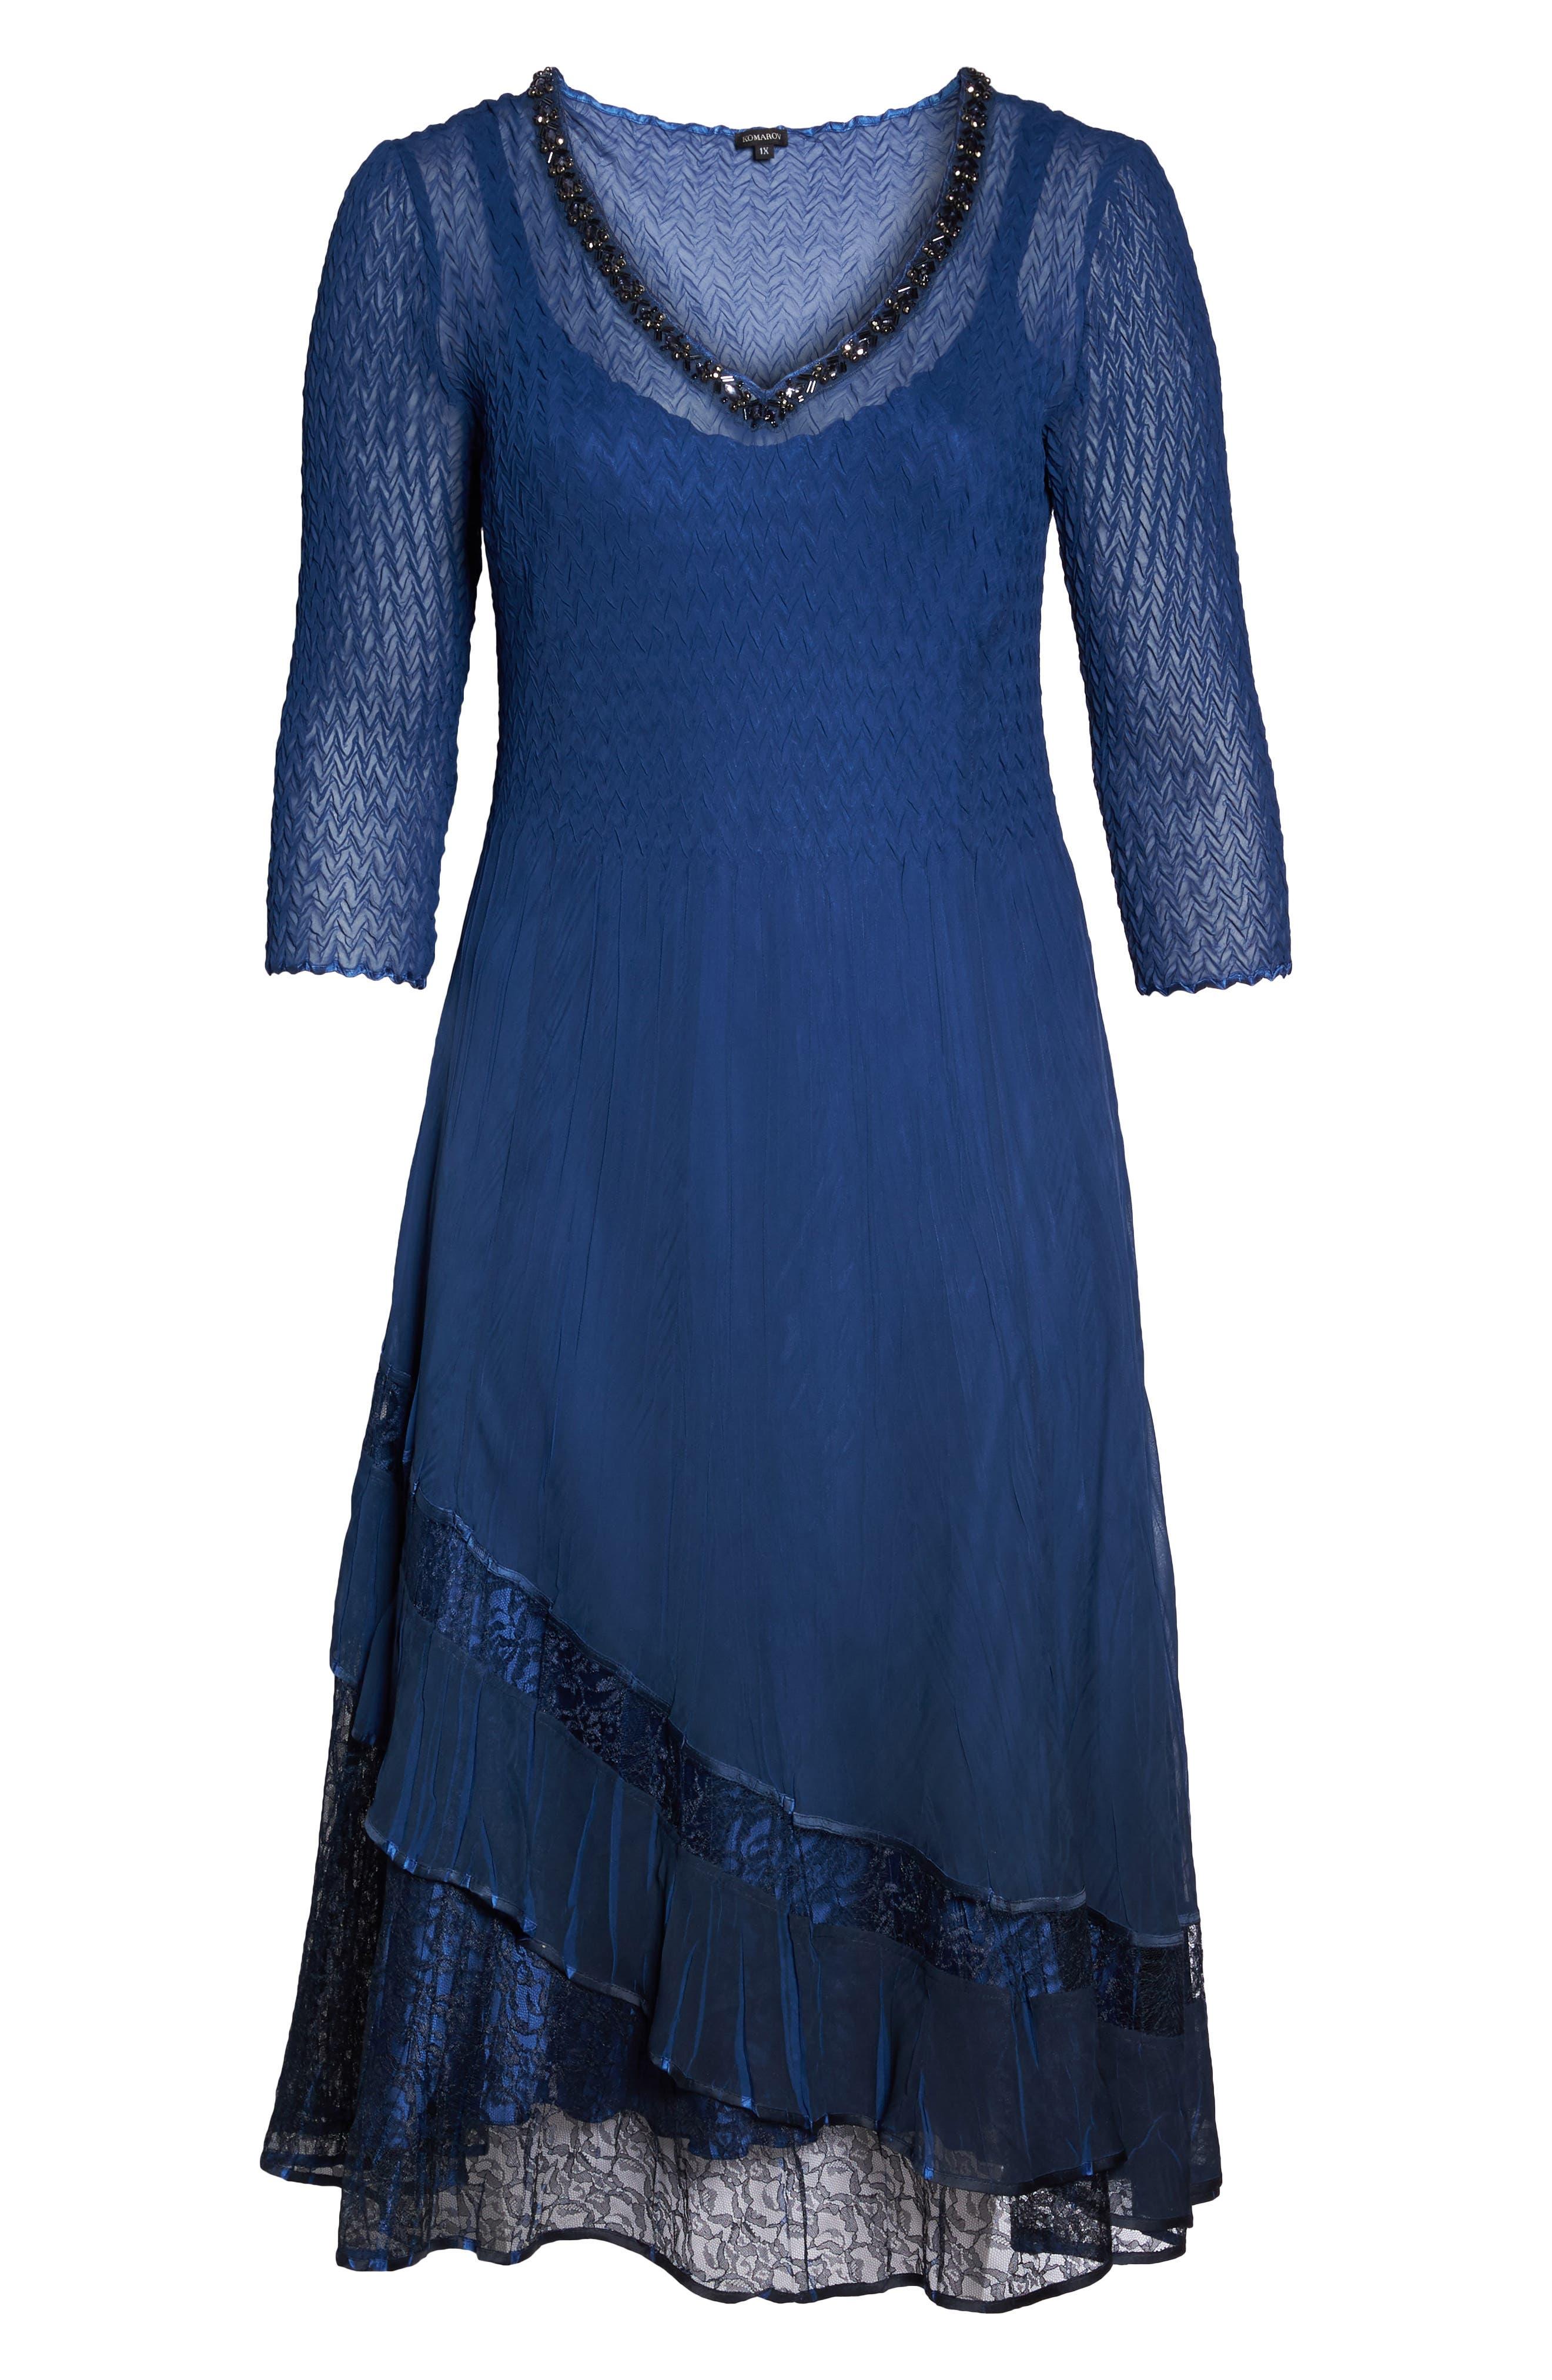 Charmeuse & Chiffon A-Line Dress,                             Alternate thumbnail 6, color,                             Navy Black Ombre